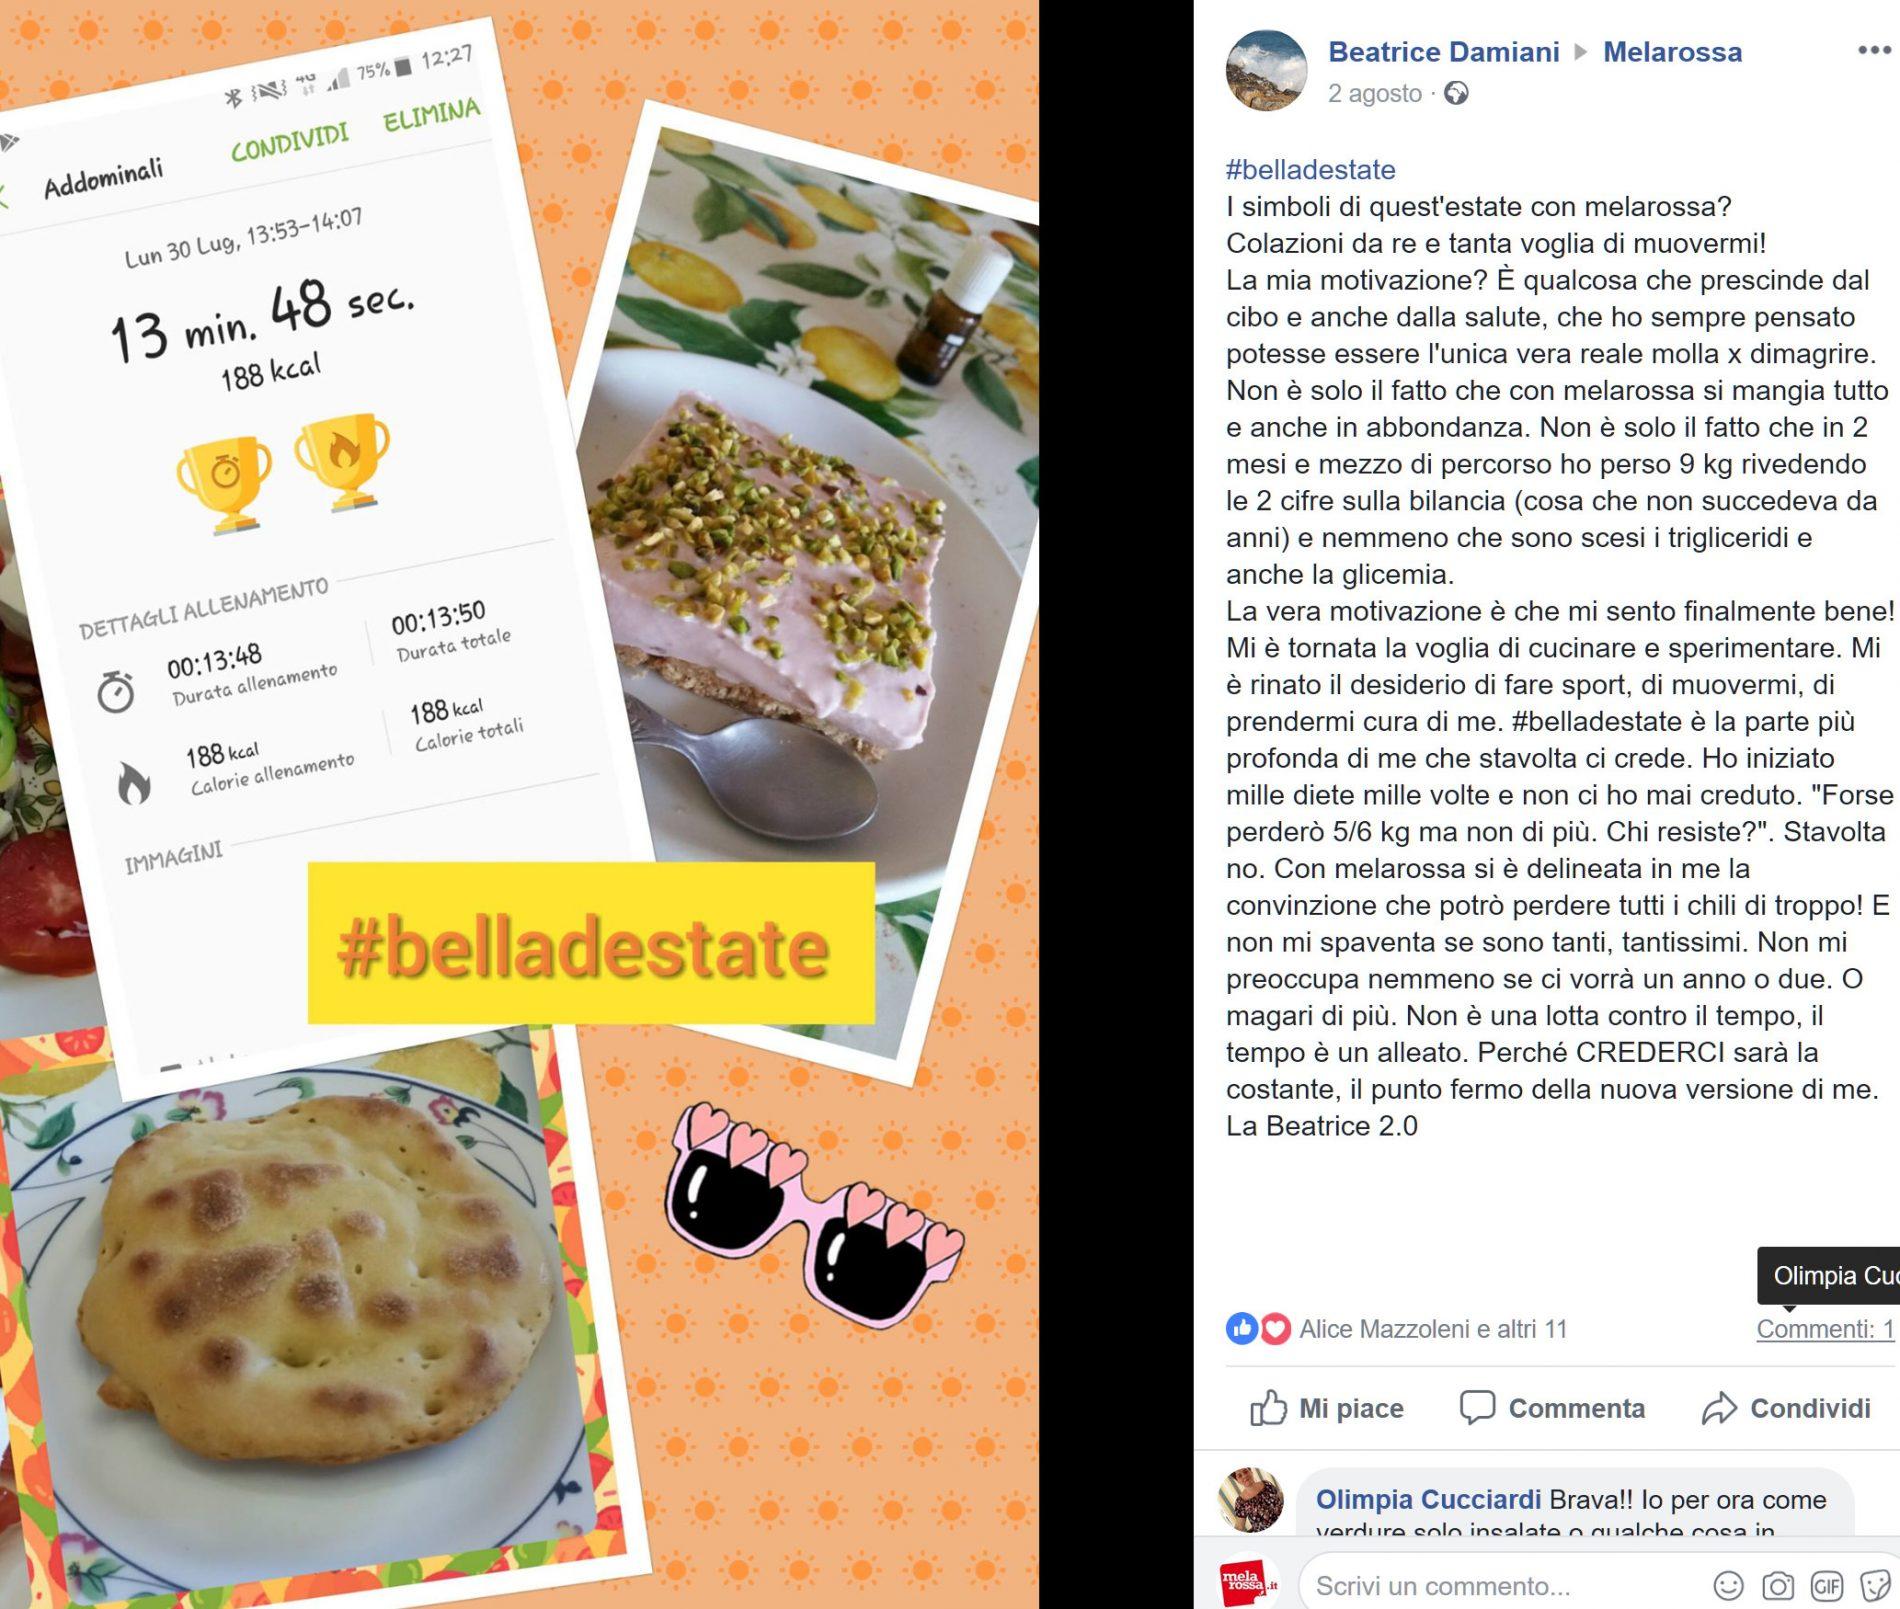 Beatrice Damiani #belladestate